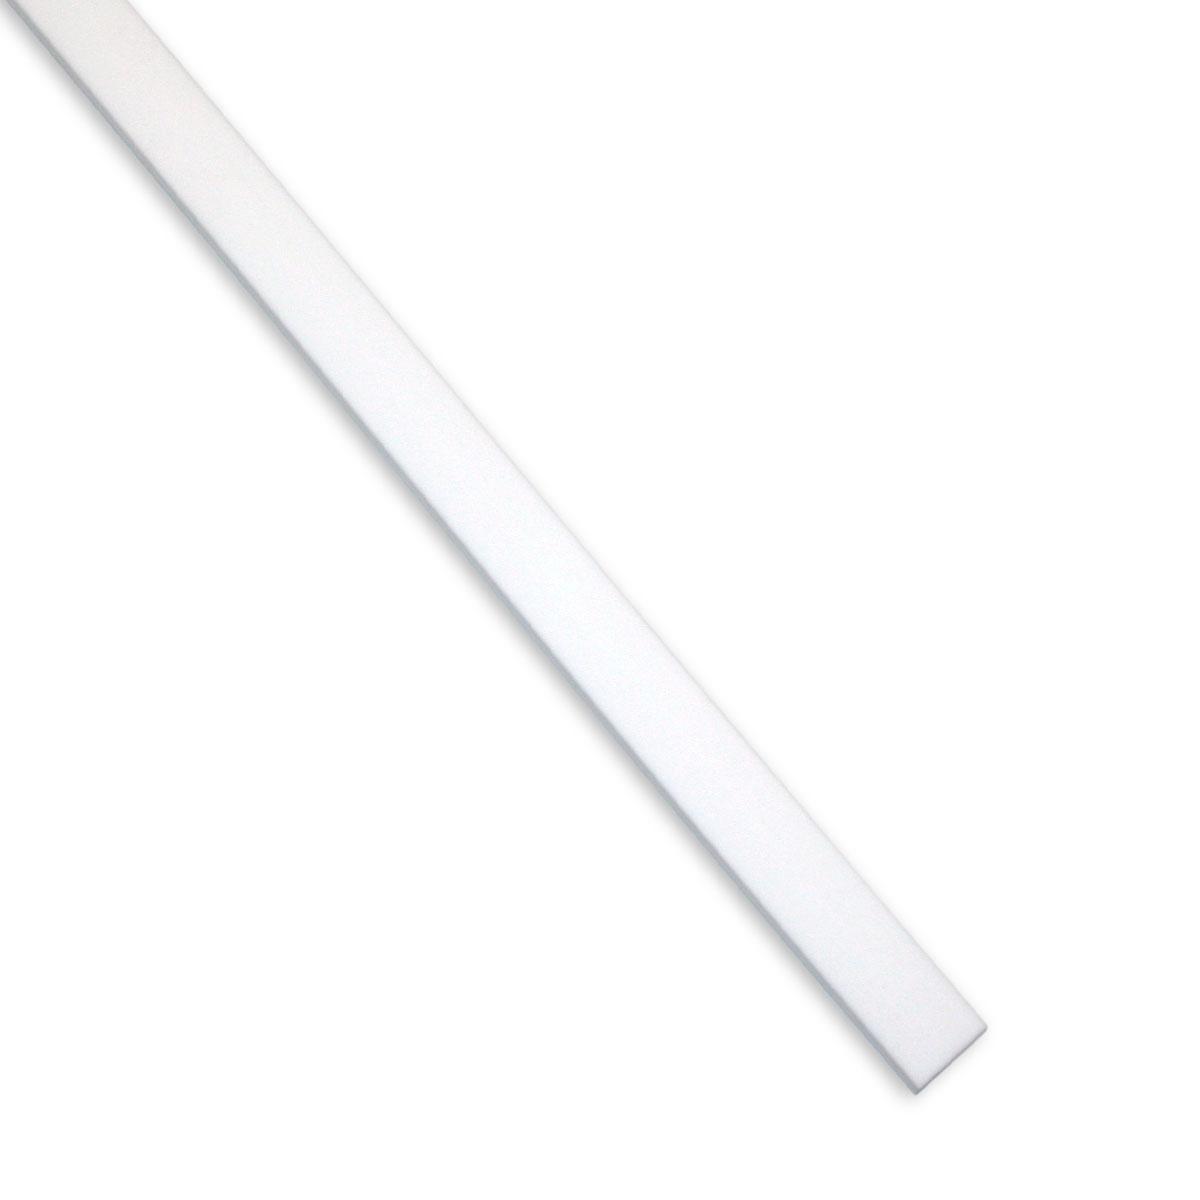 teflonband flach fr vertikalstnder heatsoakframe